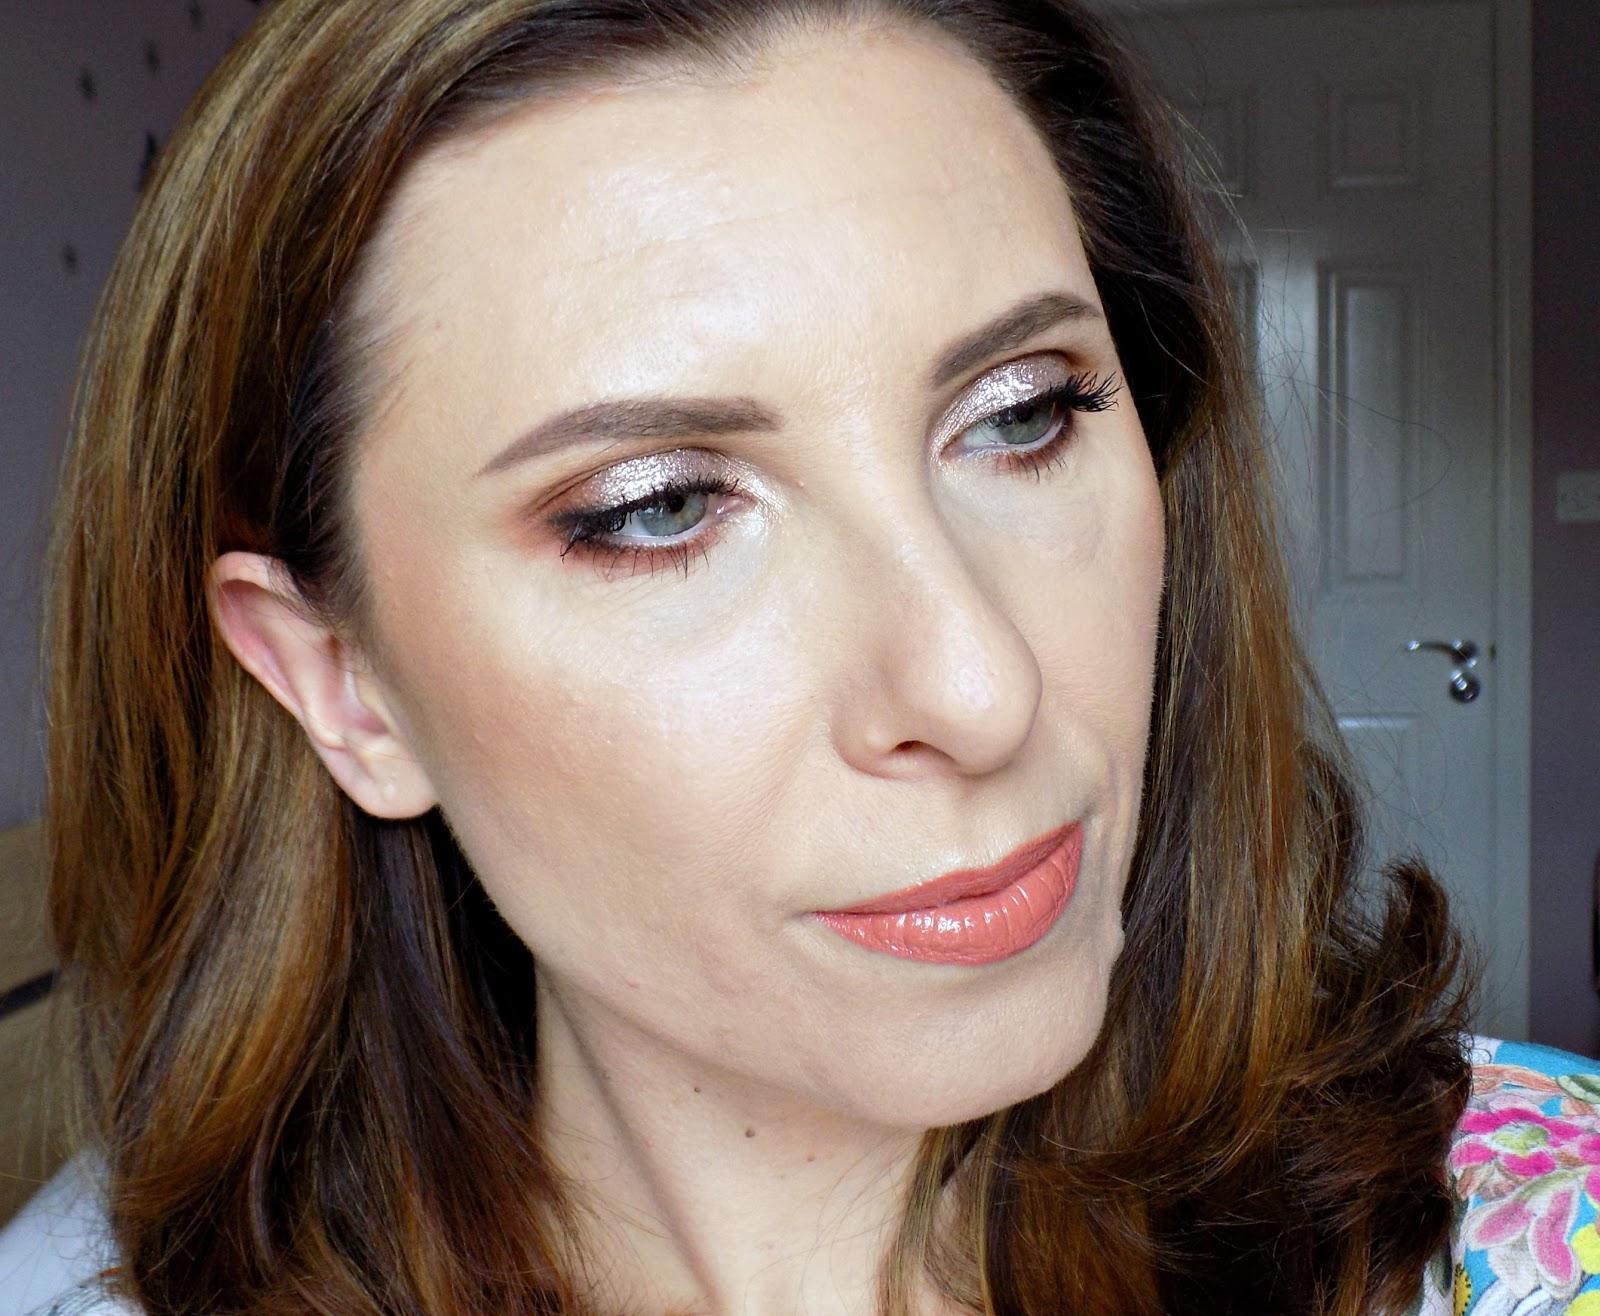 Makeup look using Pixi Liquid Fairy Lights and Pixi highlighters